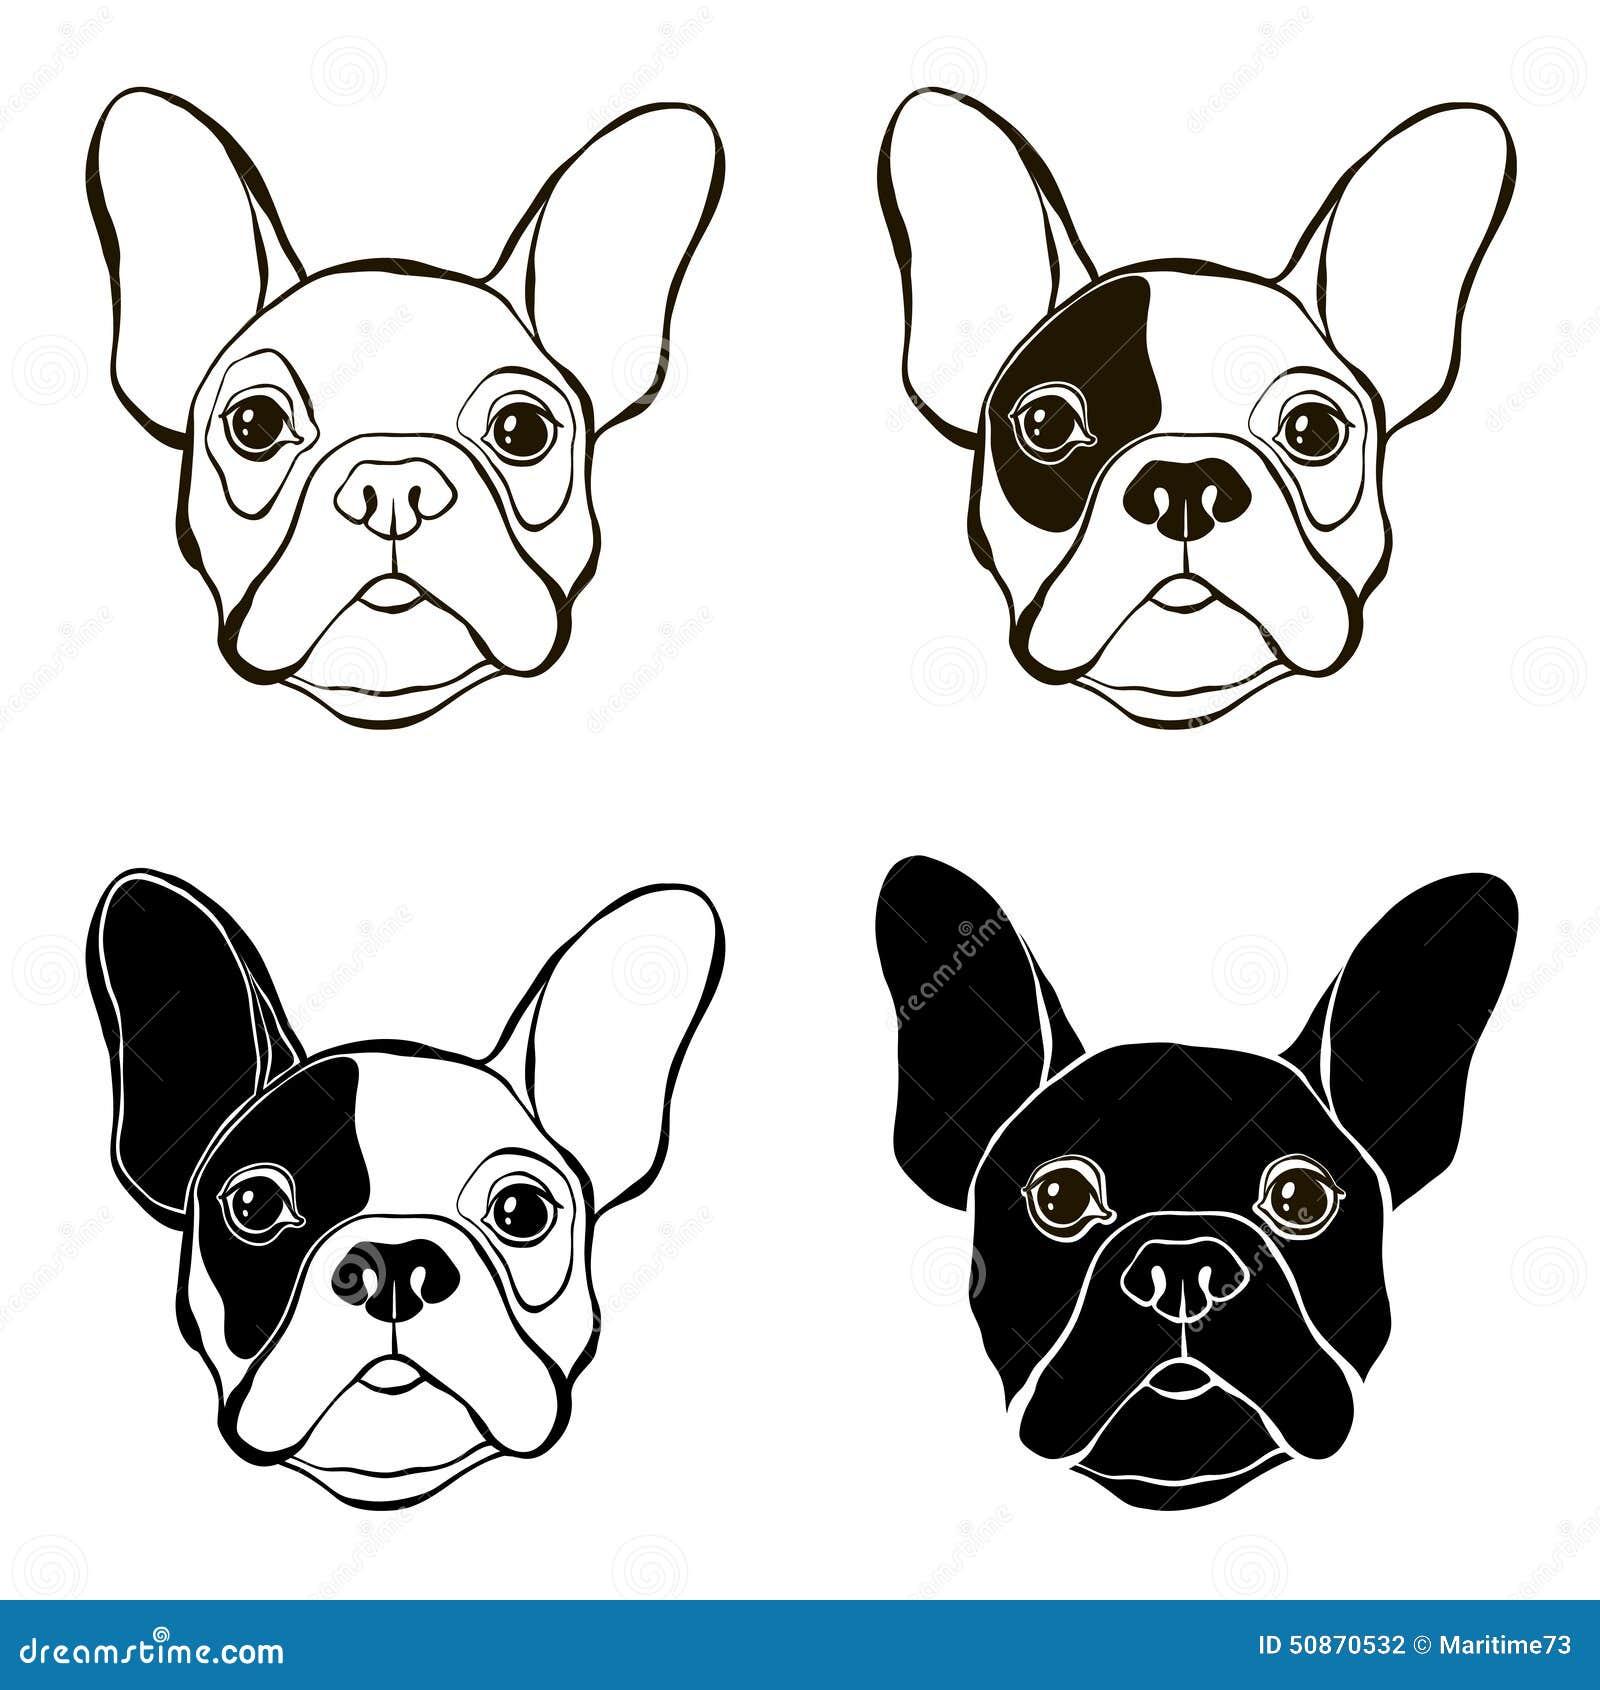 French Bulldog. Vector Set Of Bulldog's Face. Hand-drawn Stock ...